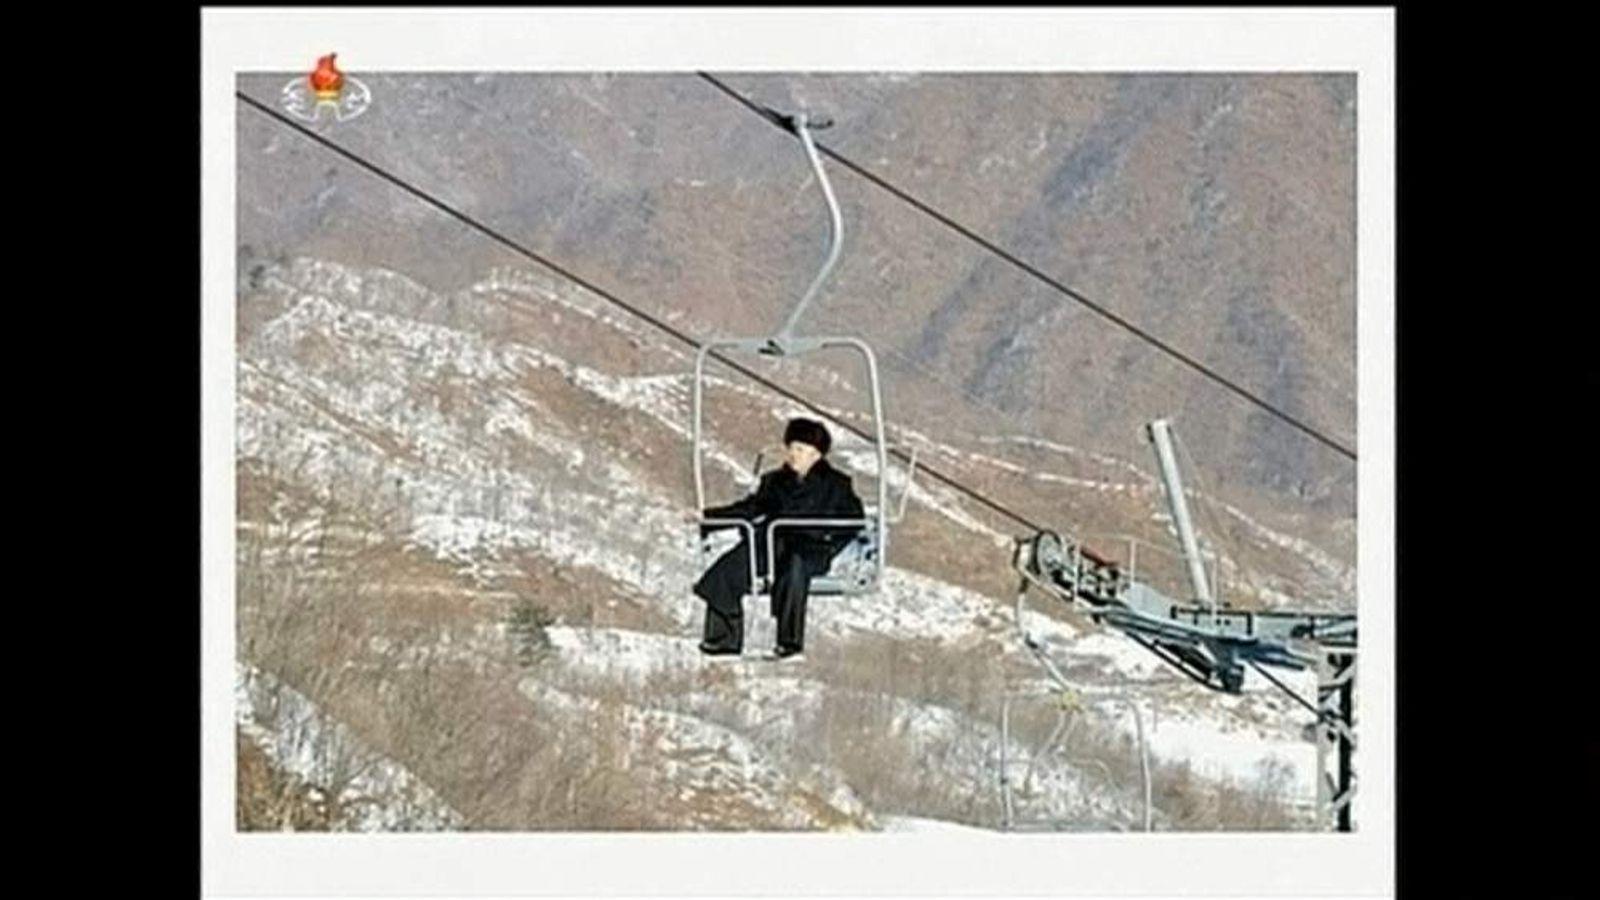 Kim Jong-Un at newly built North Korea ski resort.